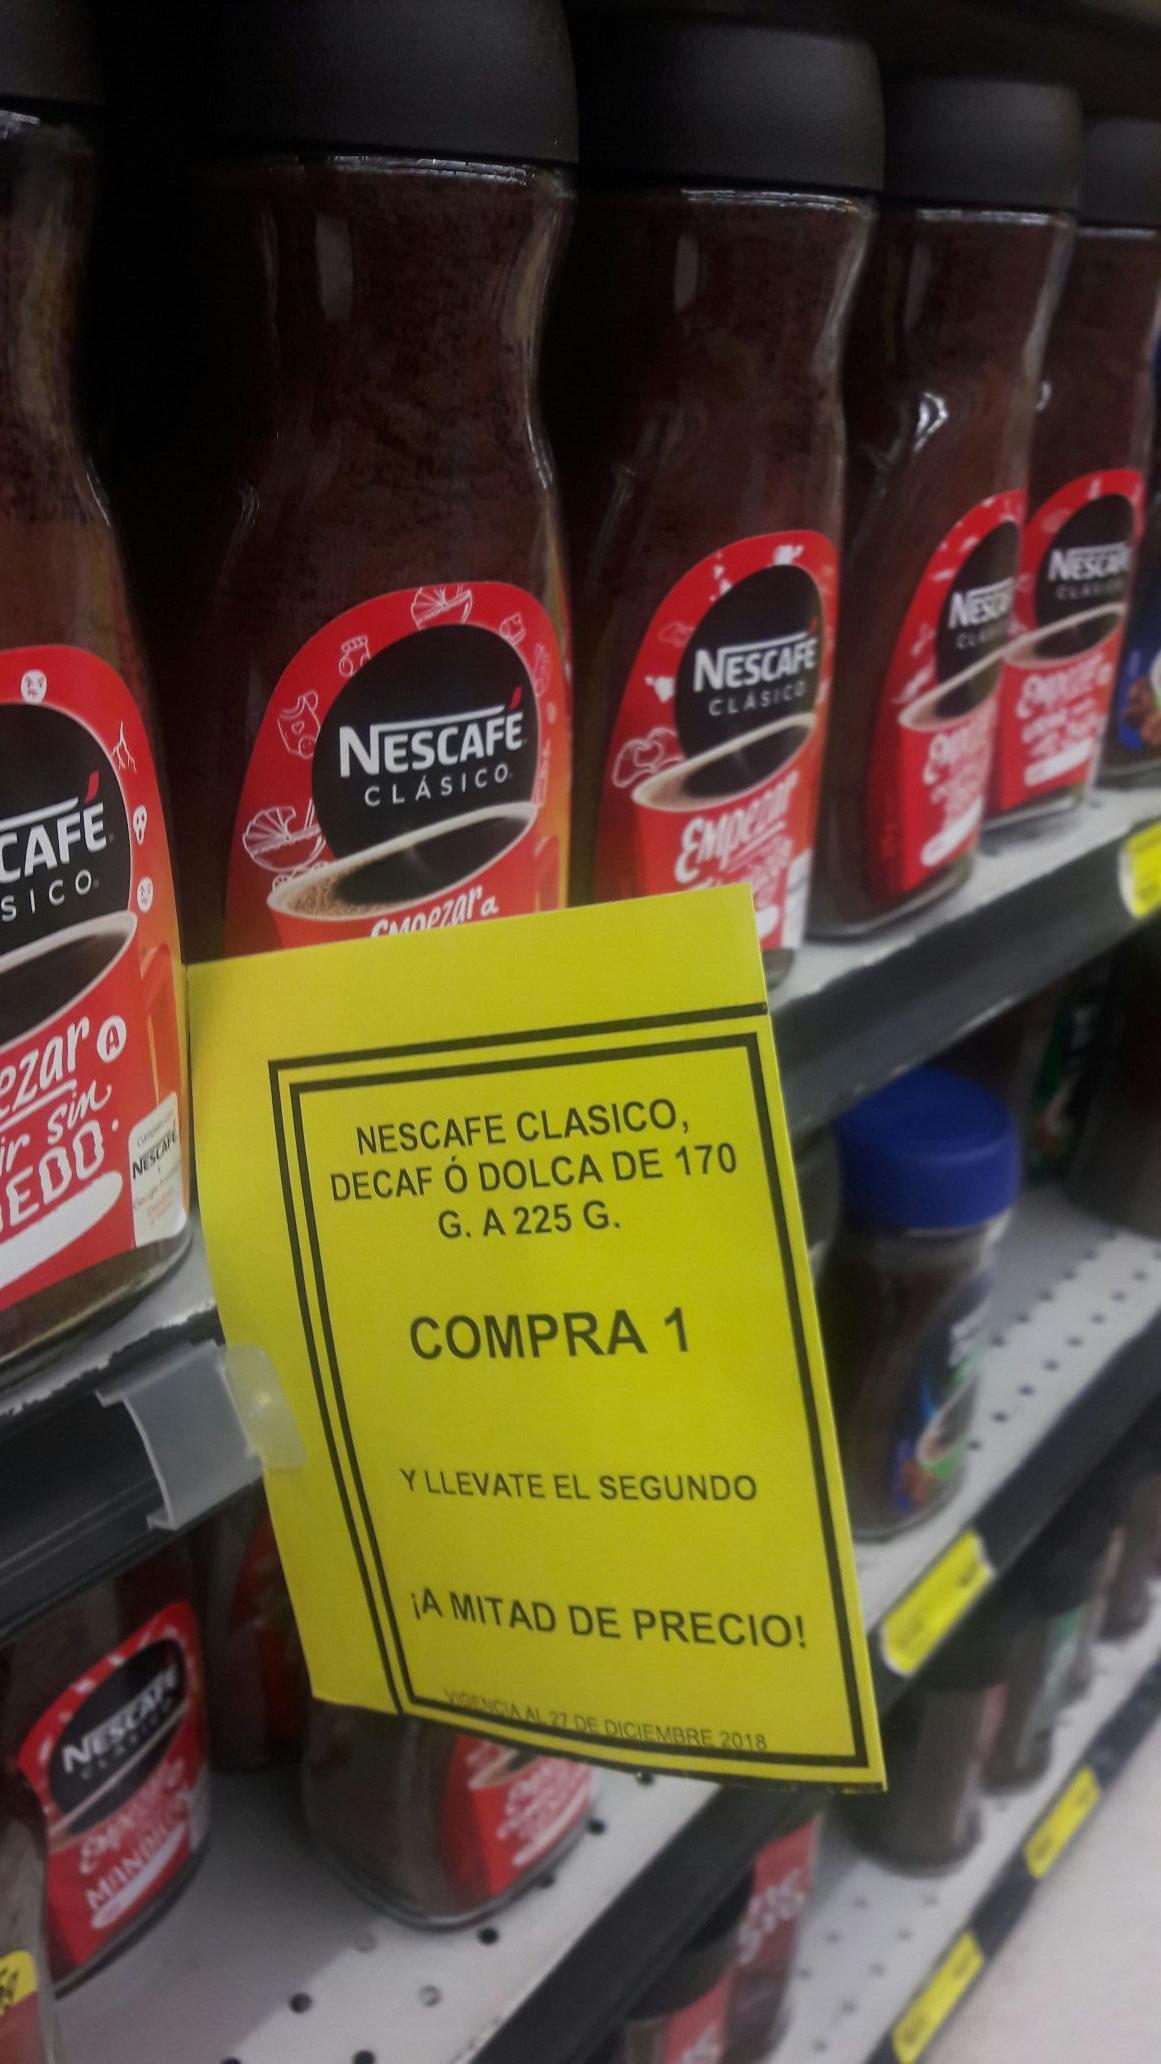 Soriana: Nescafe clasico